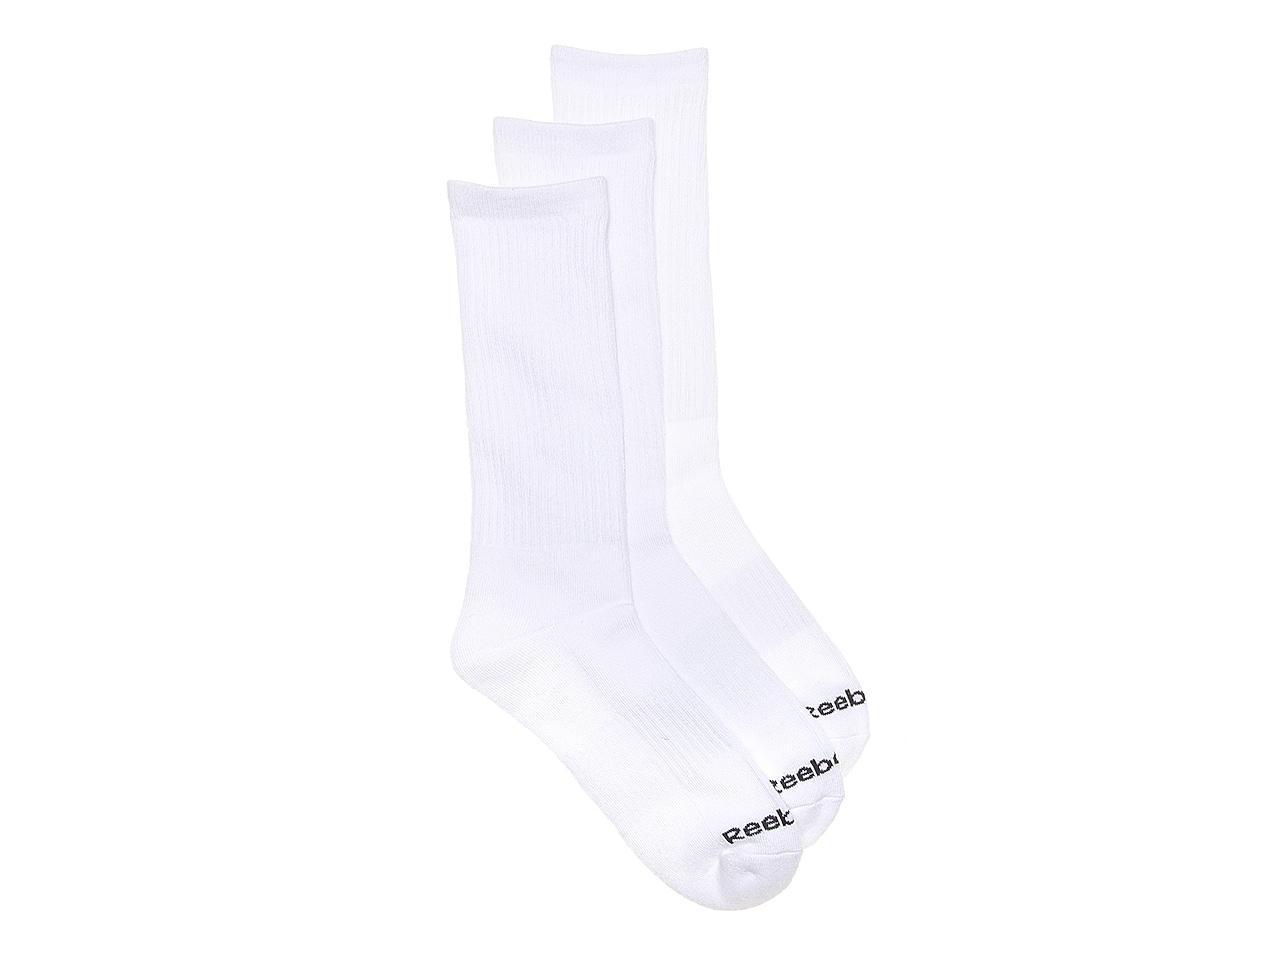 S Reebok Mens White Crew Socks Pack of 6 Size 6-12.5 Retails $20.00